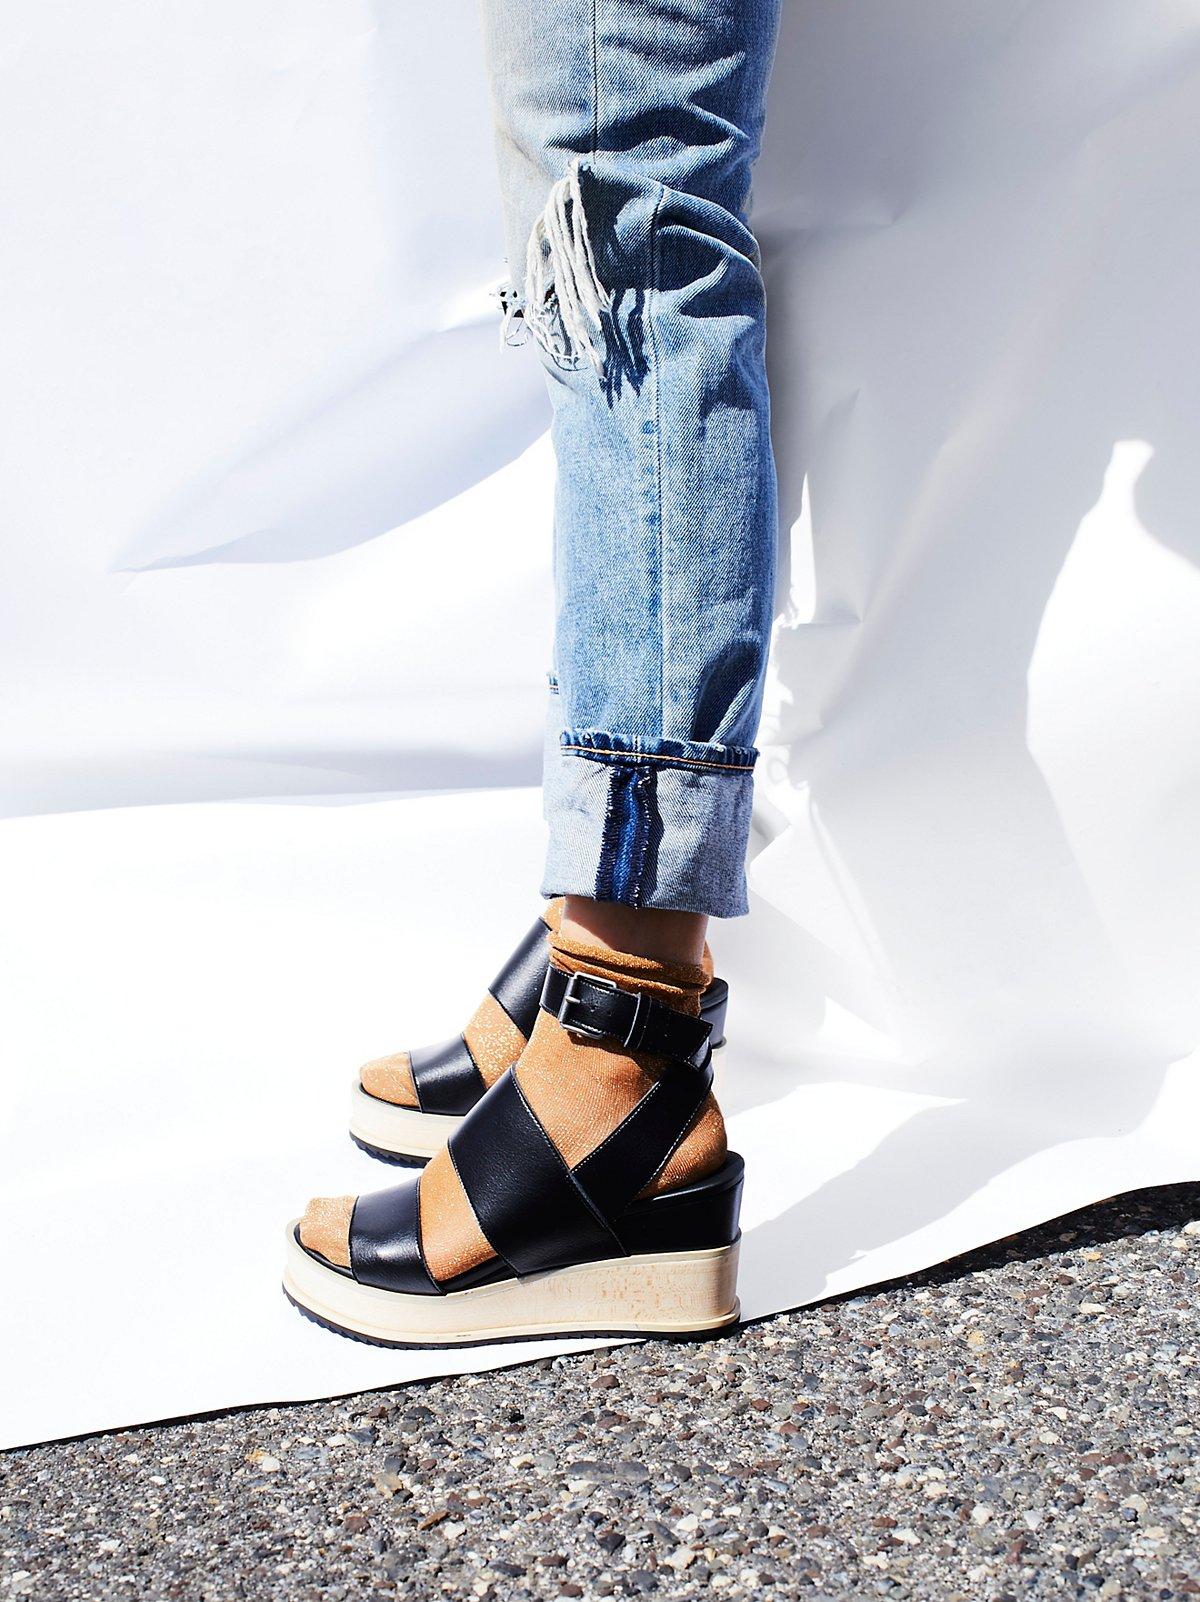 Dorian人造革坡跟鞋